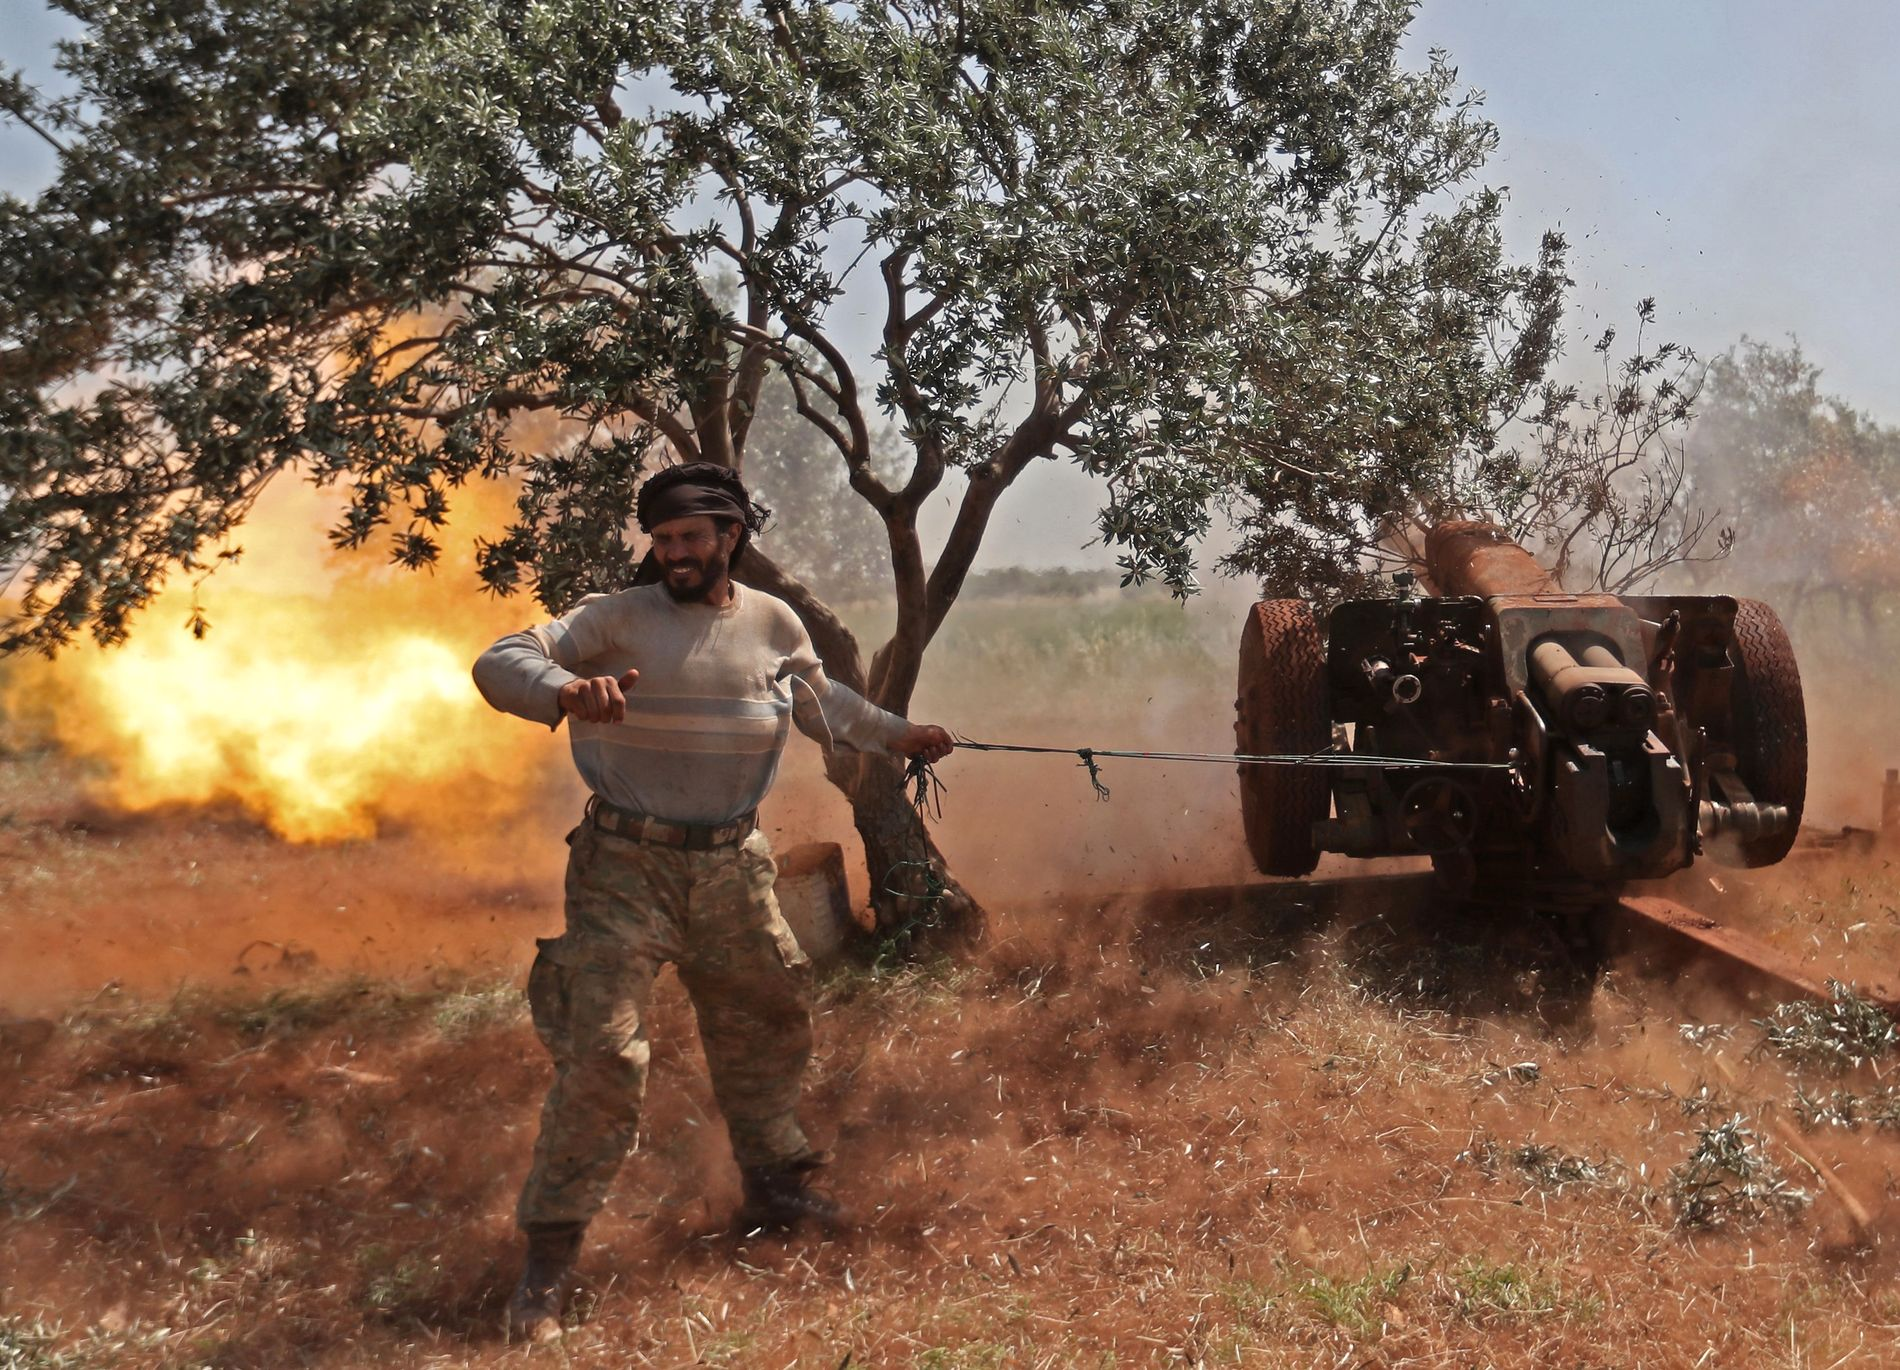 BAKKEKRIG: En kriger i den tyrkisk-støttede opprørsgruppen National Liberation Front (NLF) fyrer mot regimestillinger i Idlib i mai.